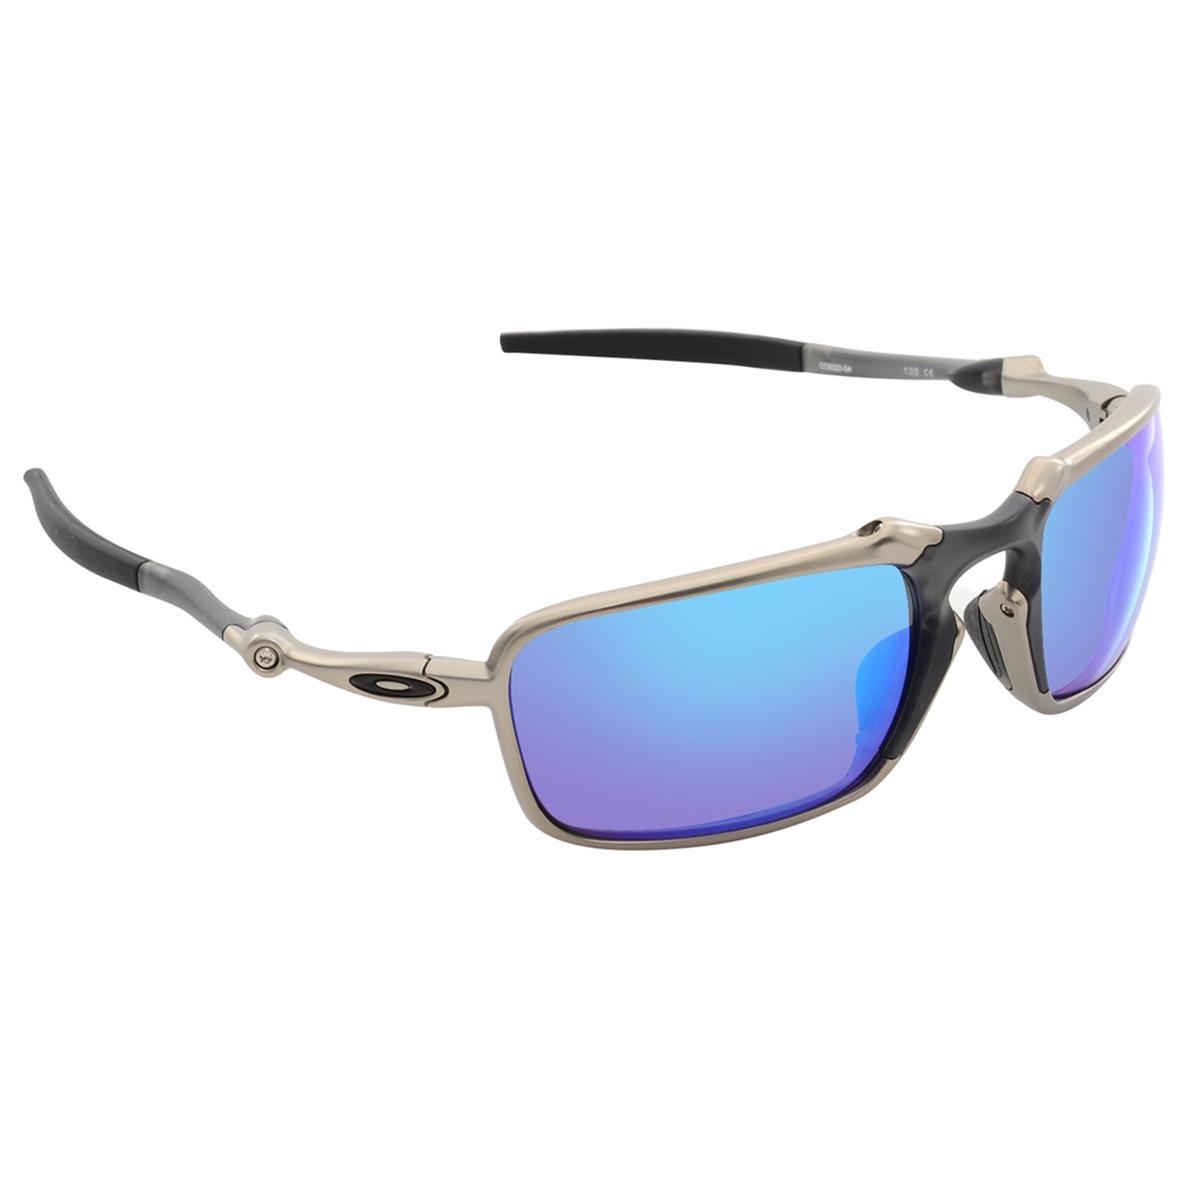 15c365fe5 óculos oakley badman plasma saphire iridium polarized. Carregando zoom.